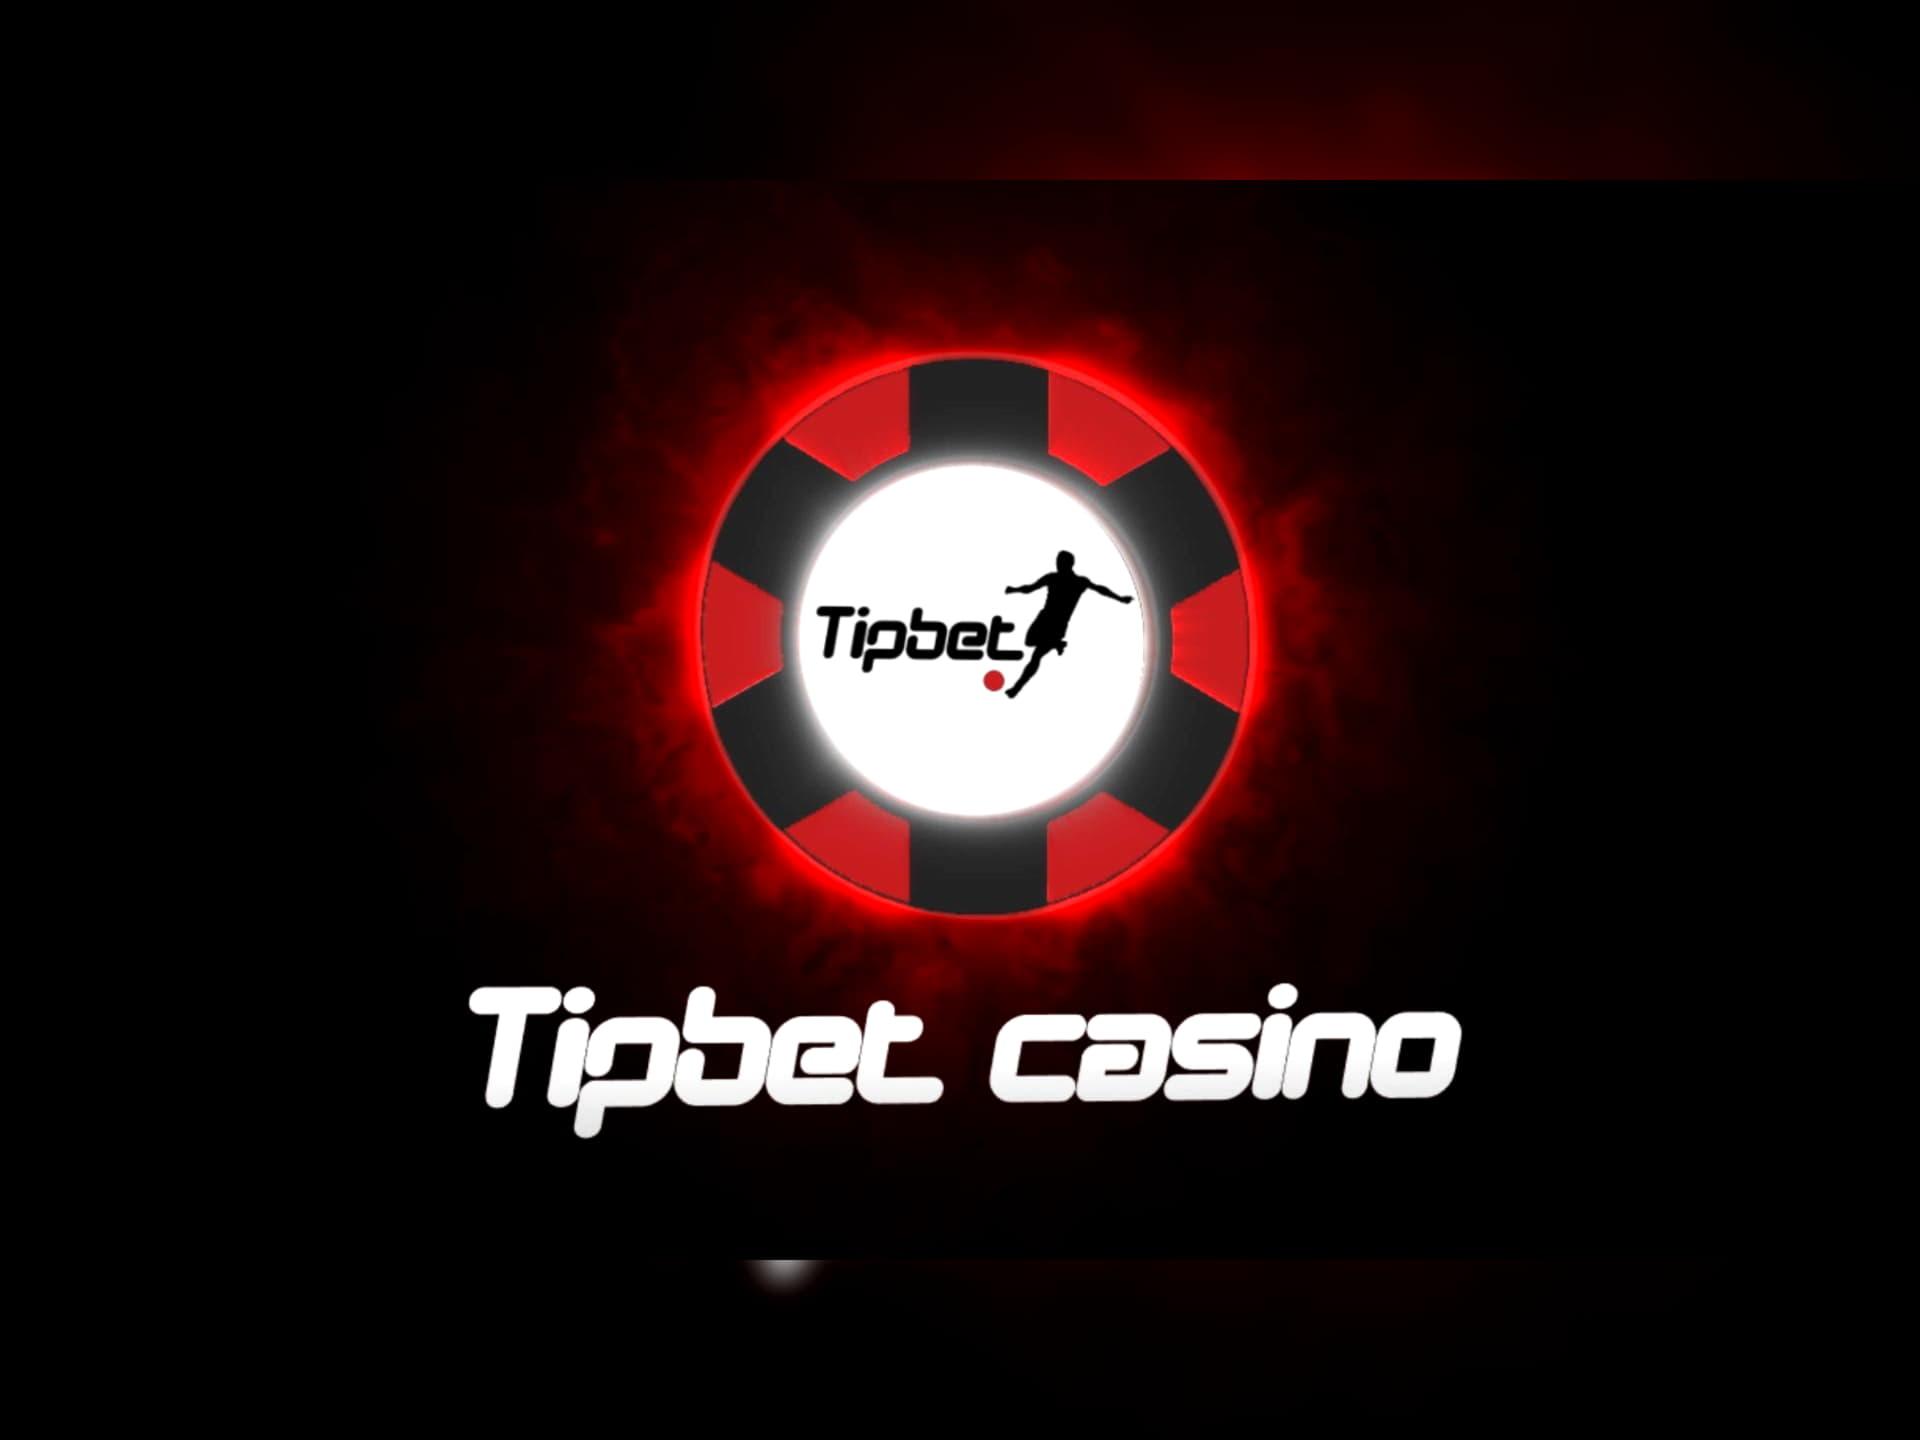 €320 Daily freeroll slot tournament at Casino com